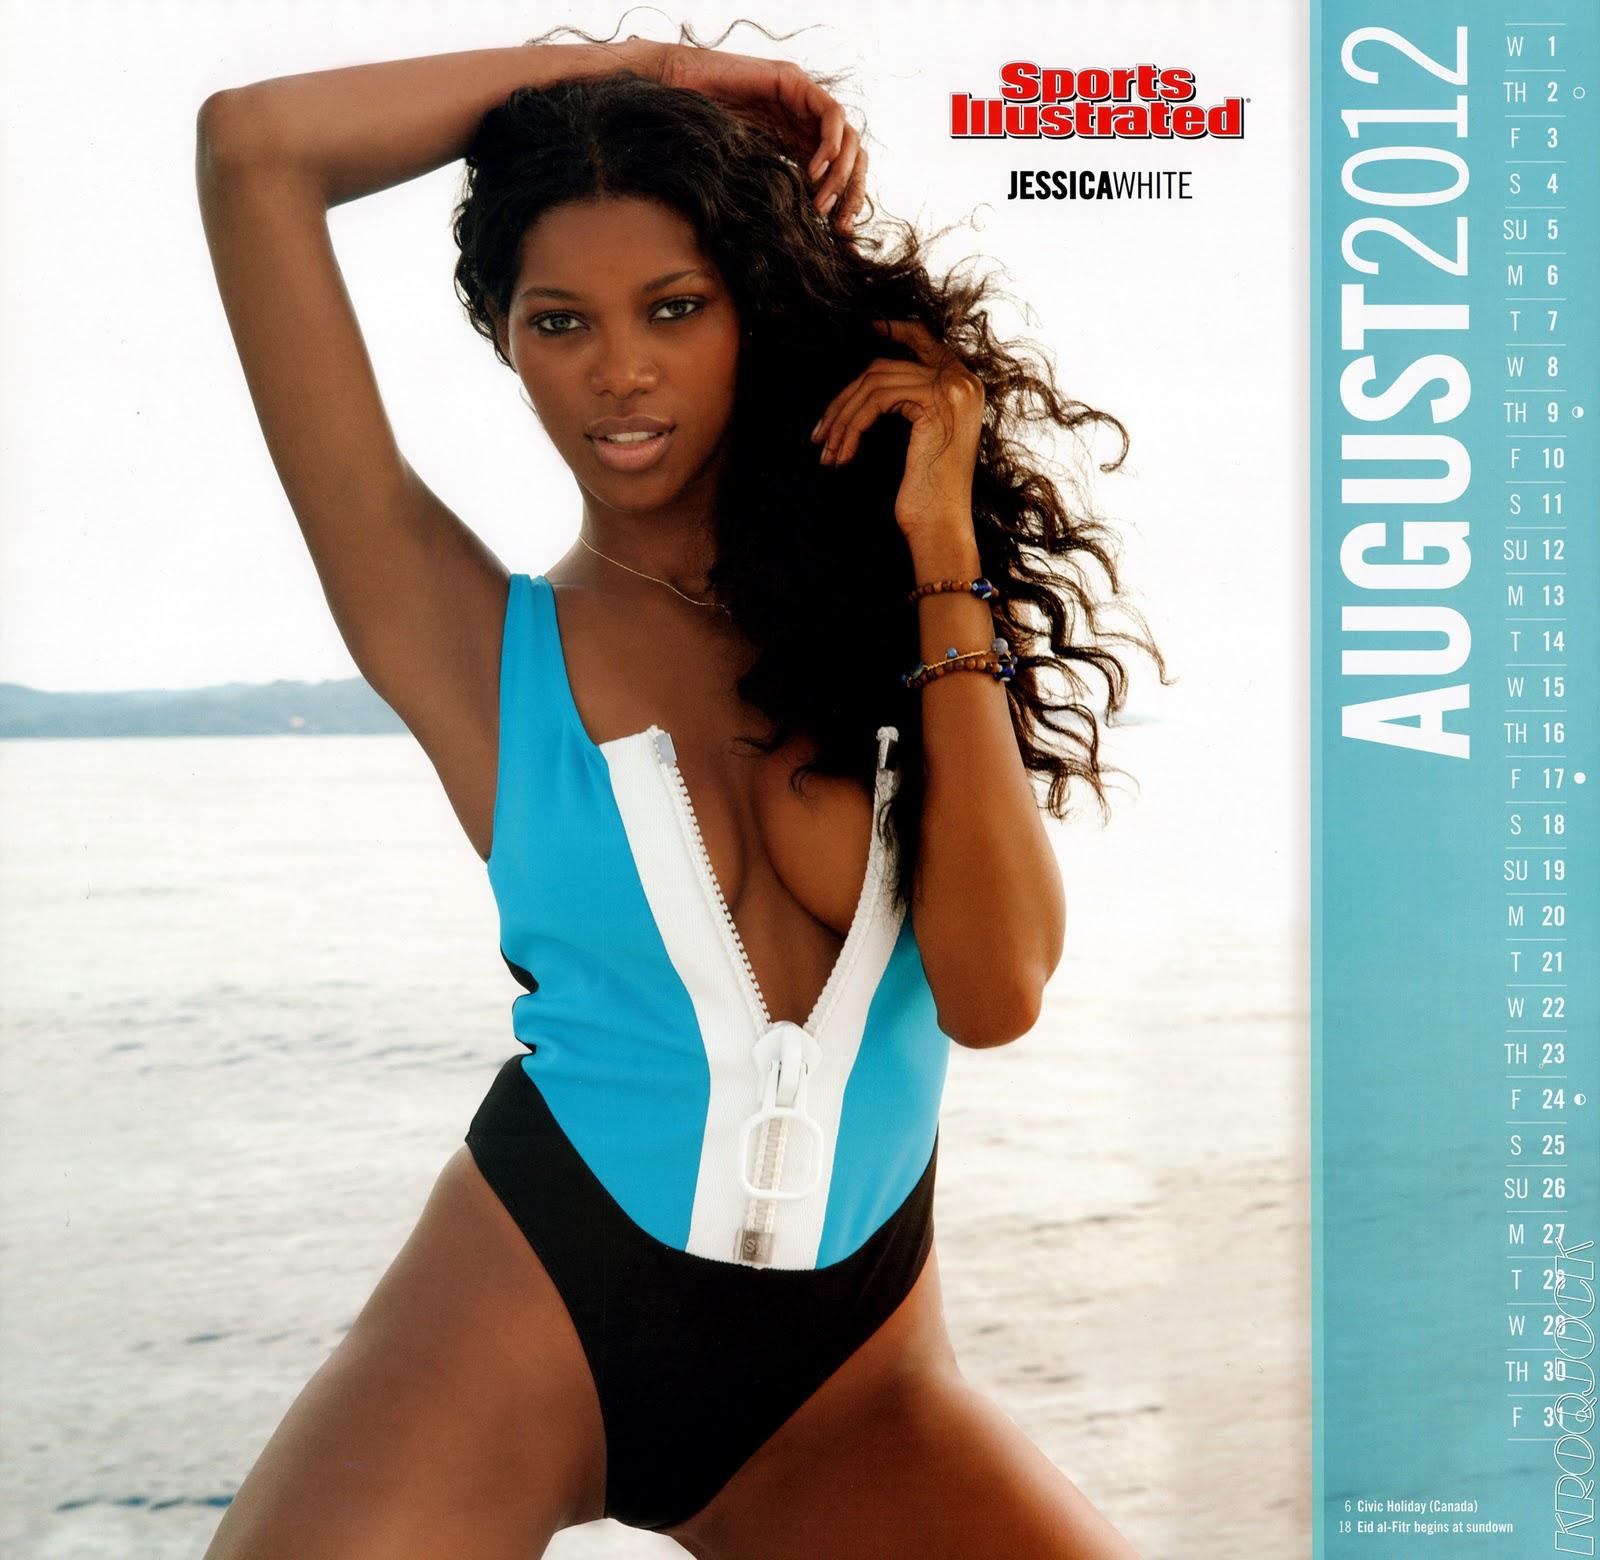 http://3.bp.blogspot.com/-x2Ww74edf9c/TrtTZ-_iG8I/AAAAAAAAL2w/7Zif91GDK6w/s1600/Sports+Illustrated+2012+Swimsuit+Calendar+%252810%2529.jpg